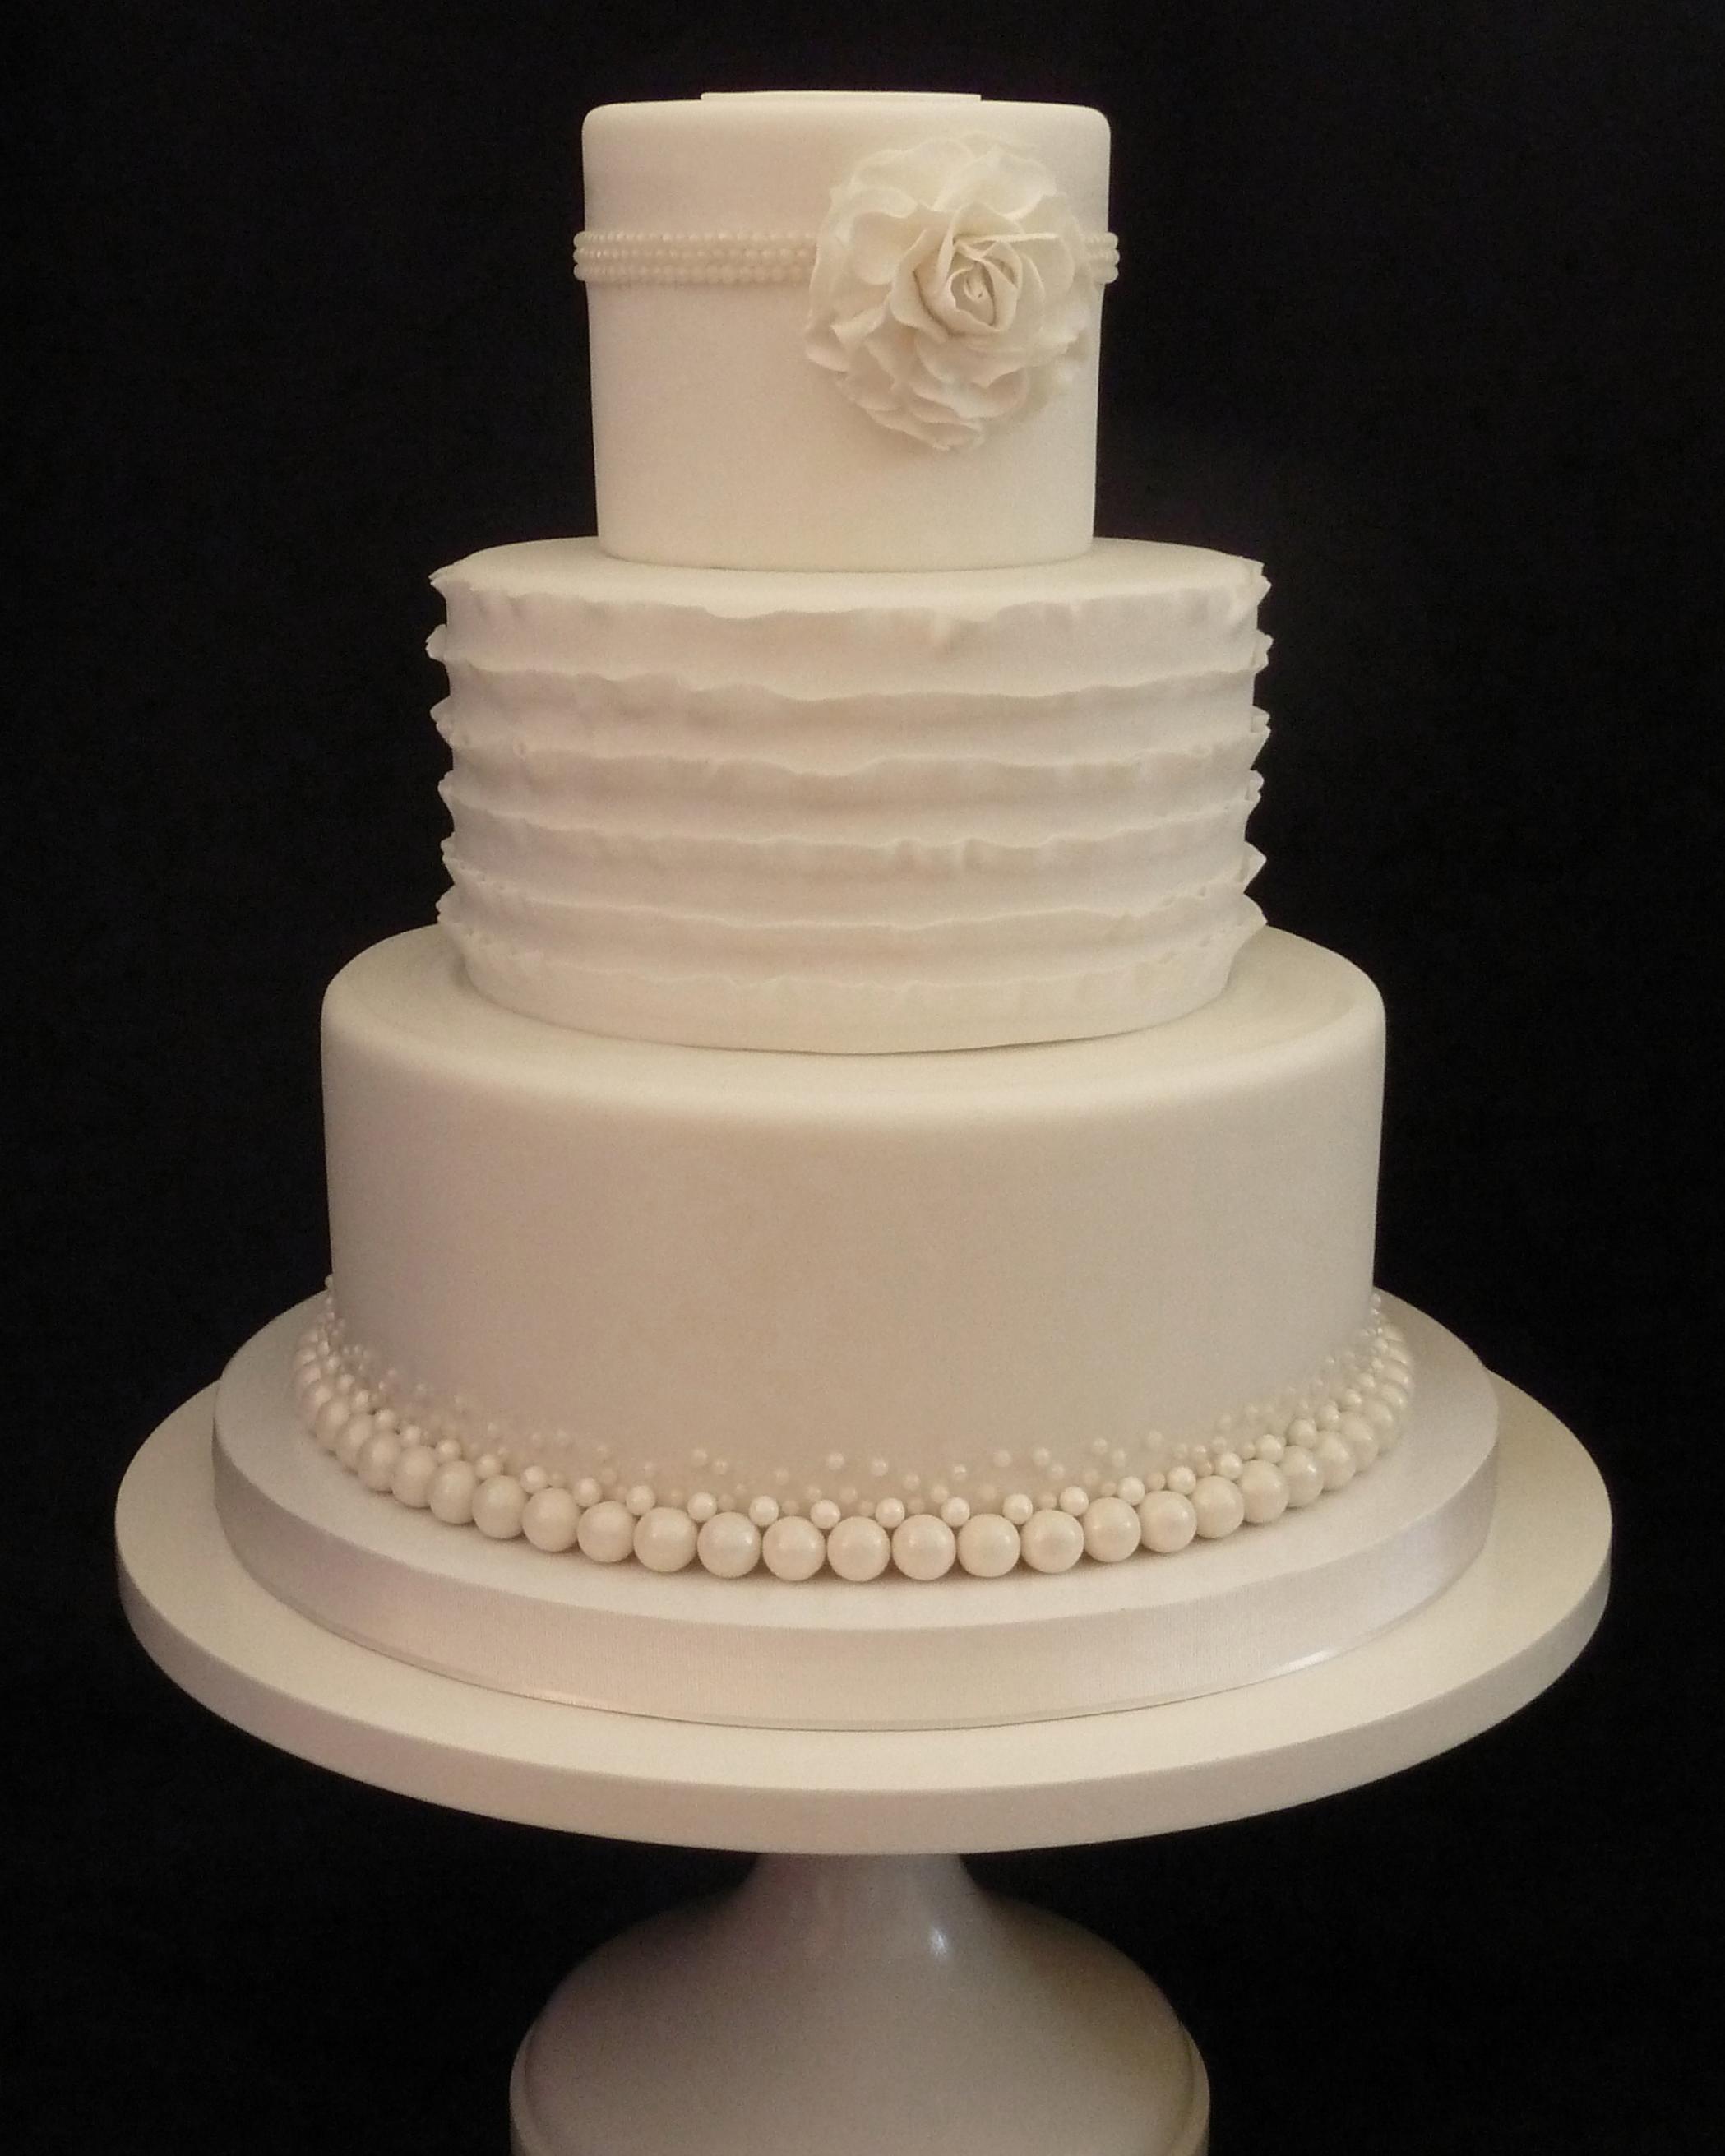 cake-pros-sugarcreations-0414.jpg